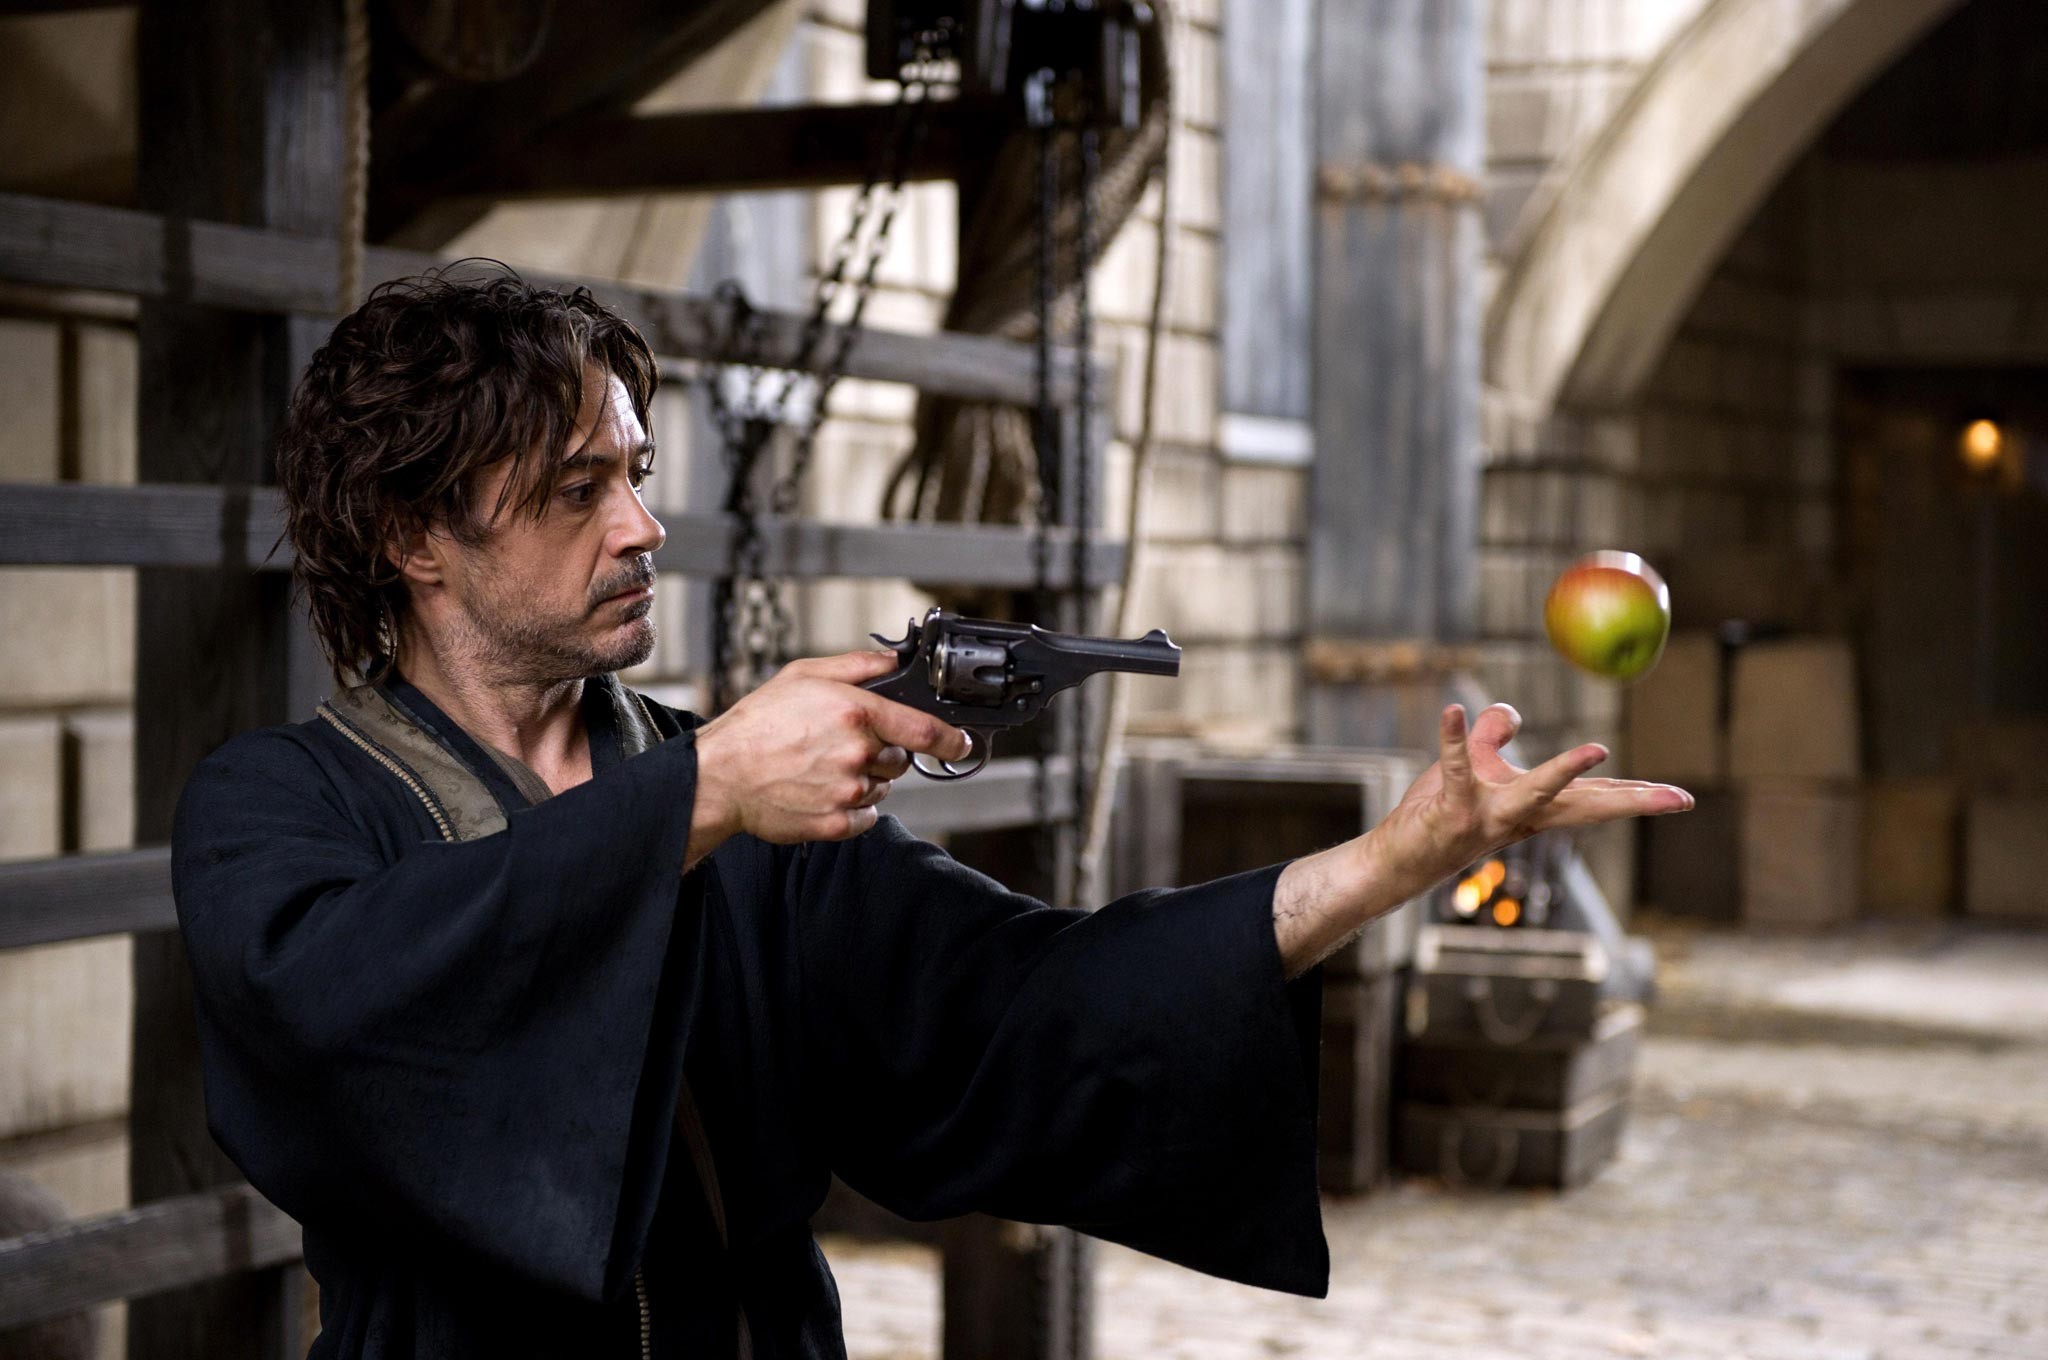 https://i0.wp.com/www.filmofilia.com/wp-content/uploads/2011/12/SHERLOCK-HOLMES_2_32.jpg